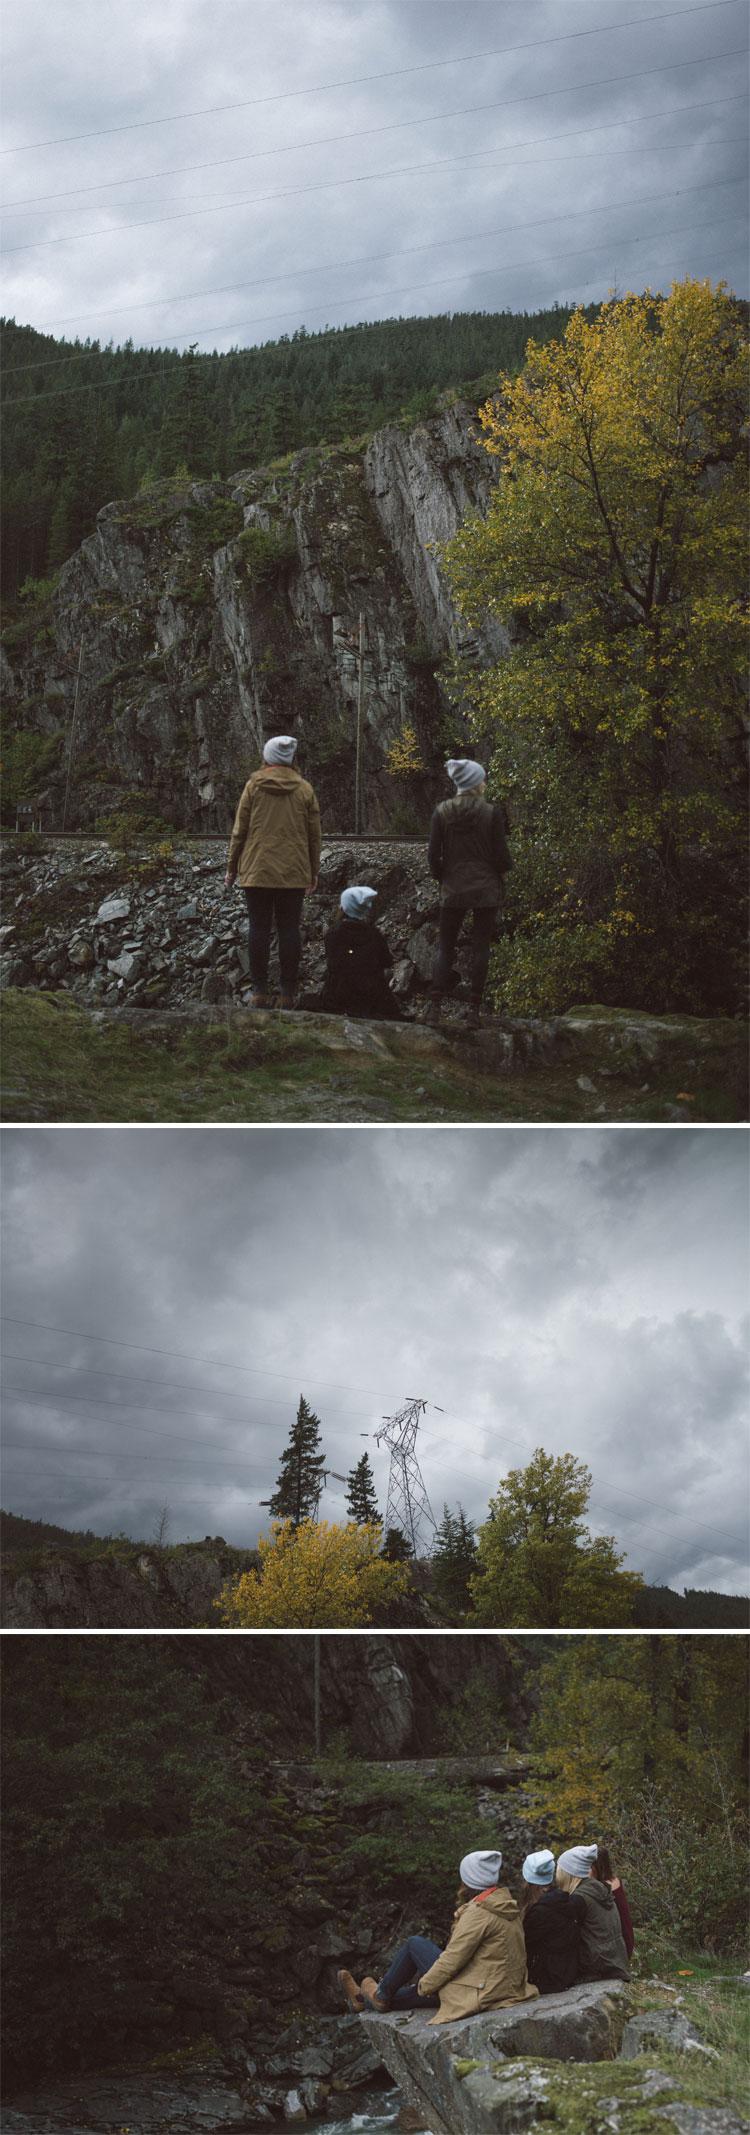 Wilderness-3-11.jpg